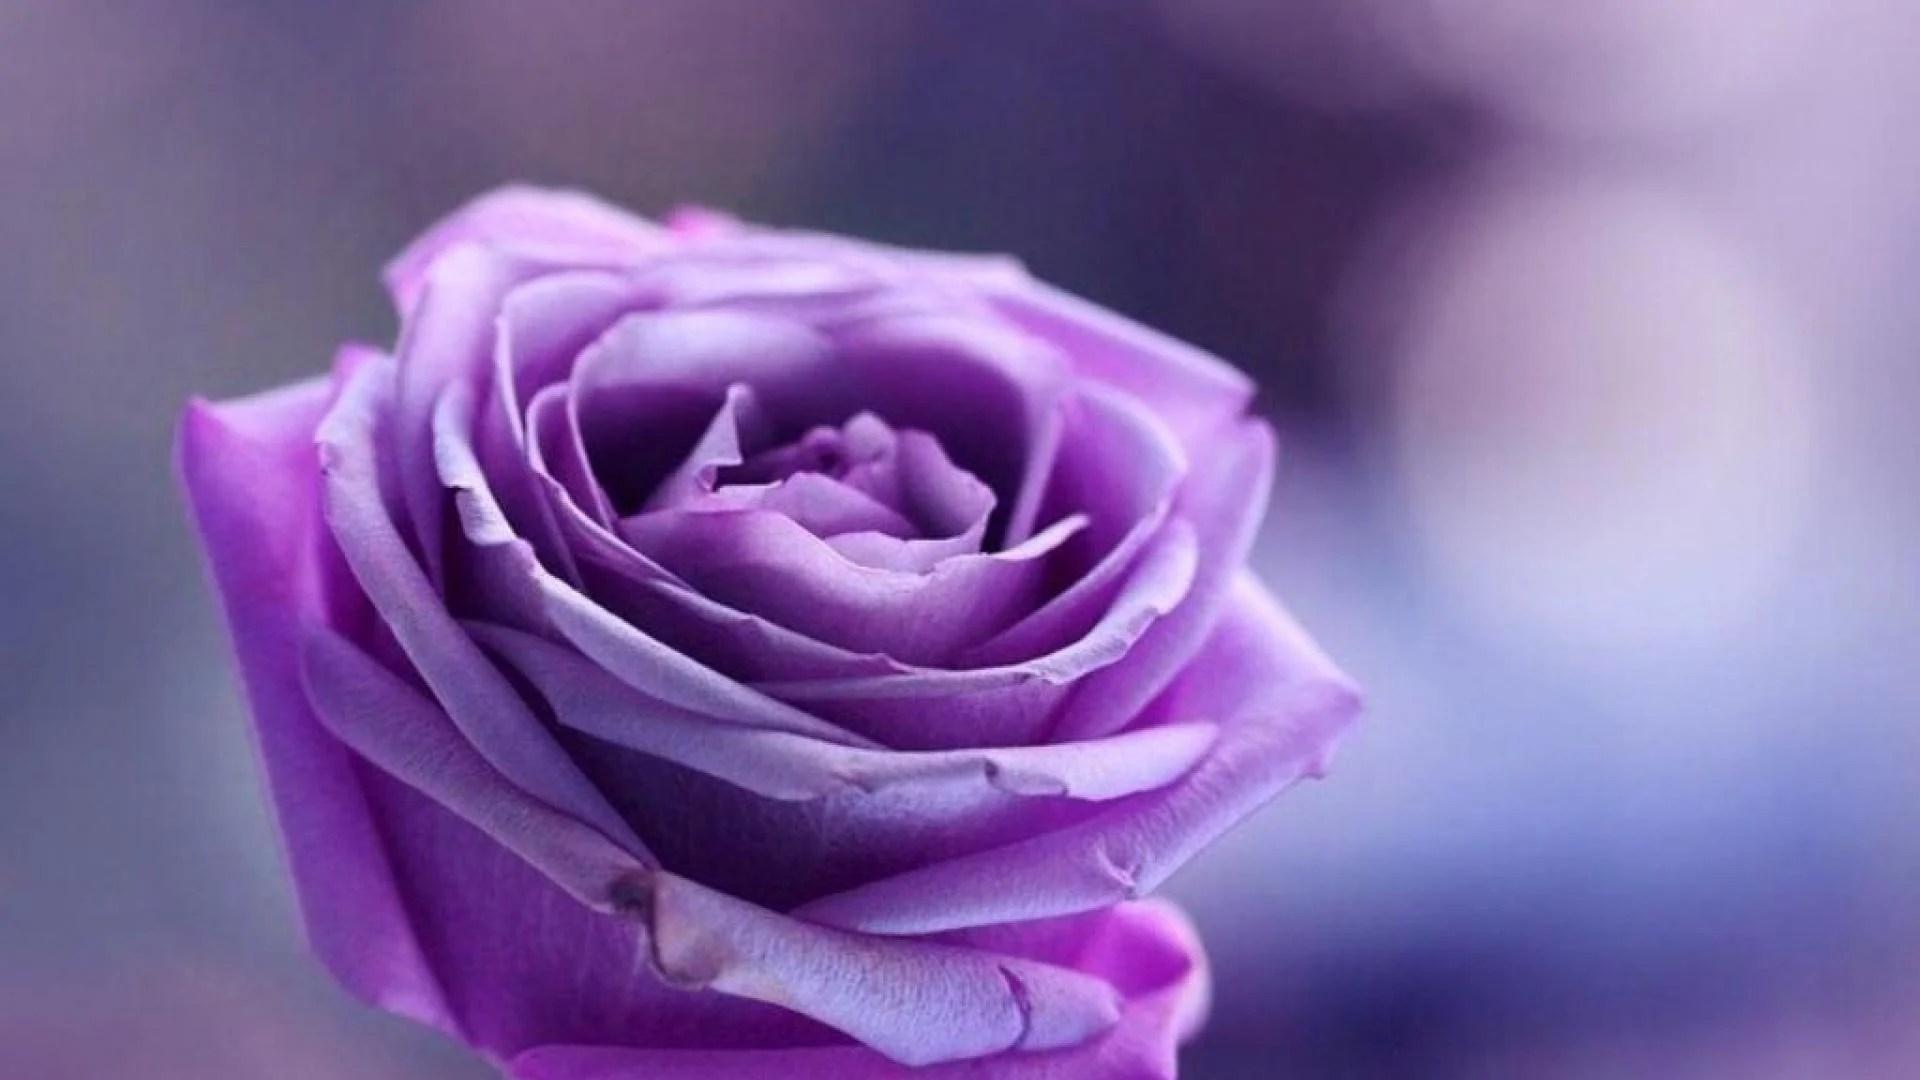 Free Wallpapers Wid Quotes Purple Roses Wallpaper Tumblr Www Pixshark Com Images